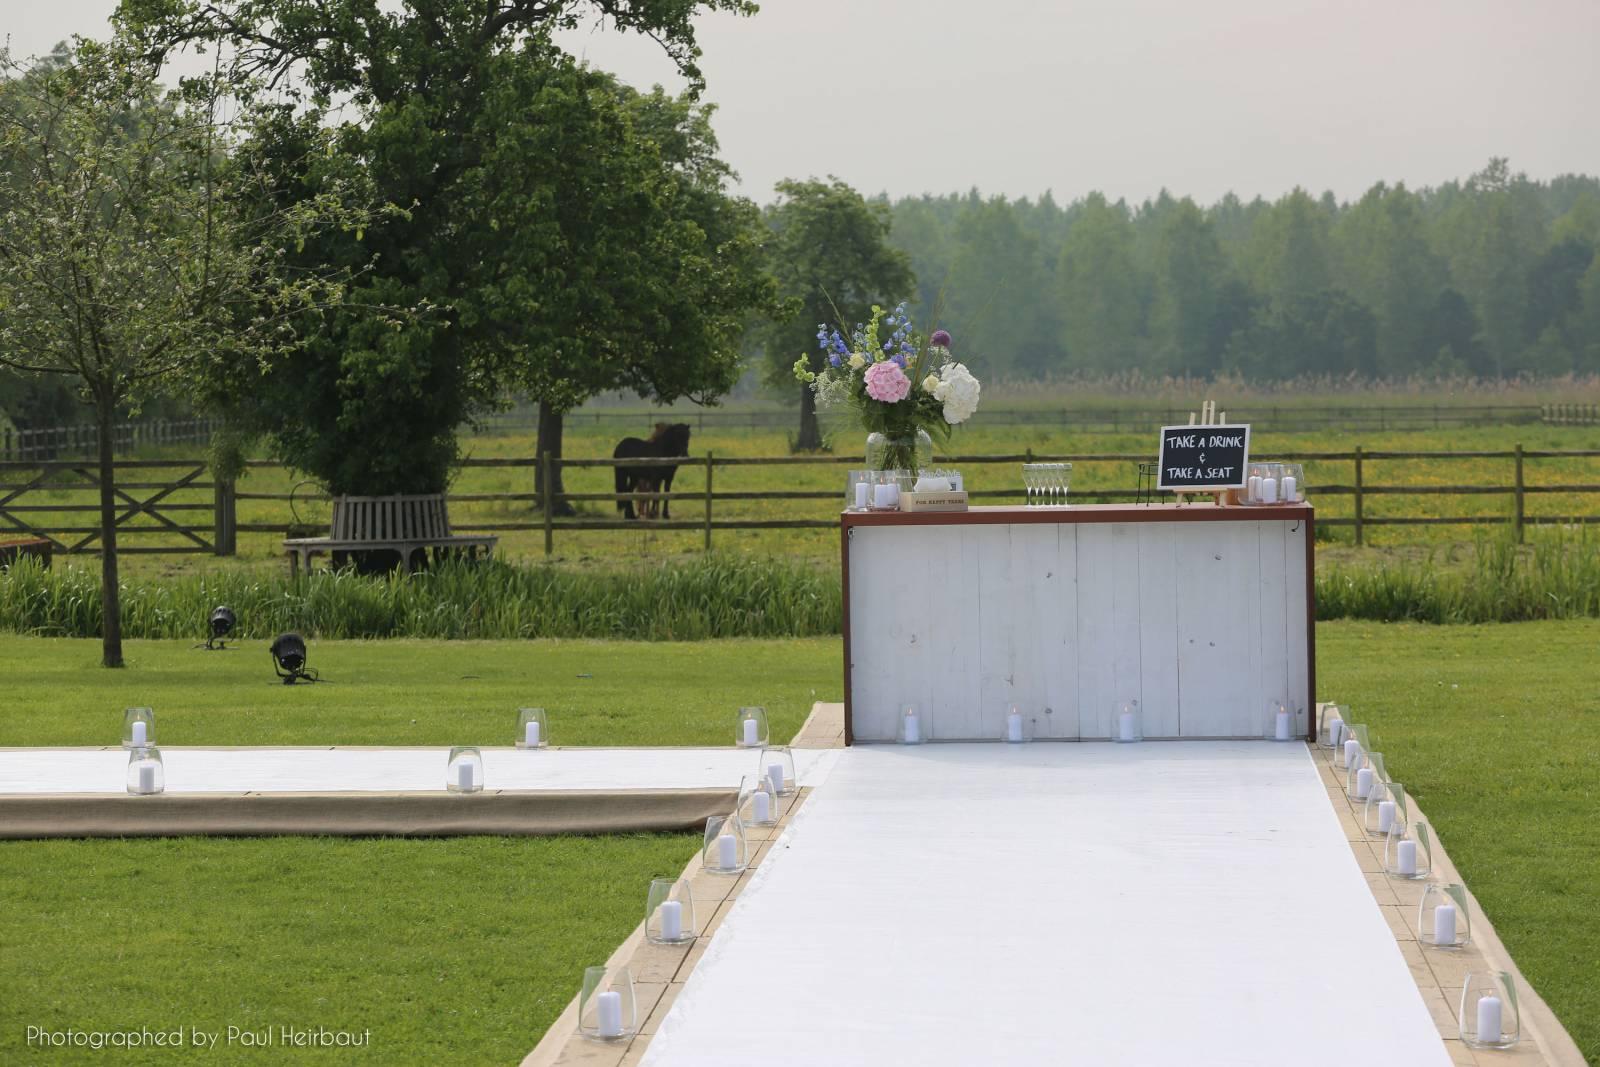 Tertia Catering15_Paul Heirbaut - House of Weddings